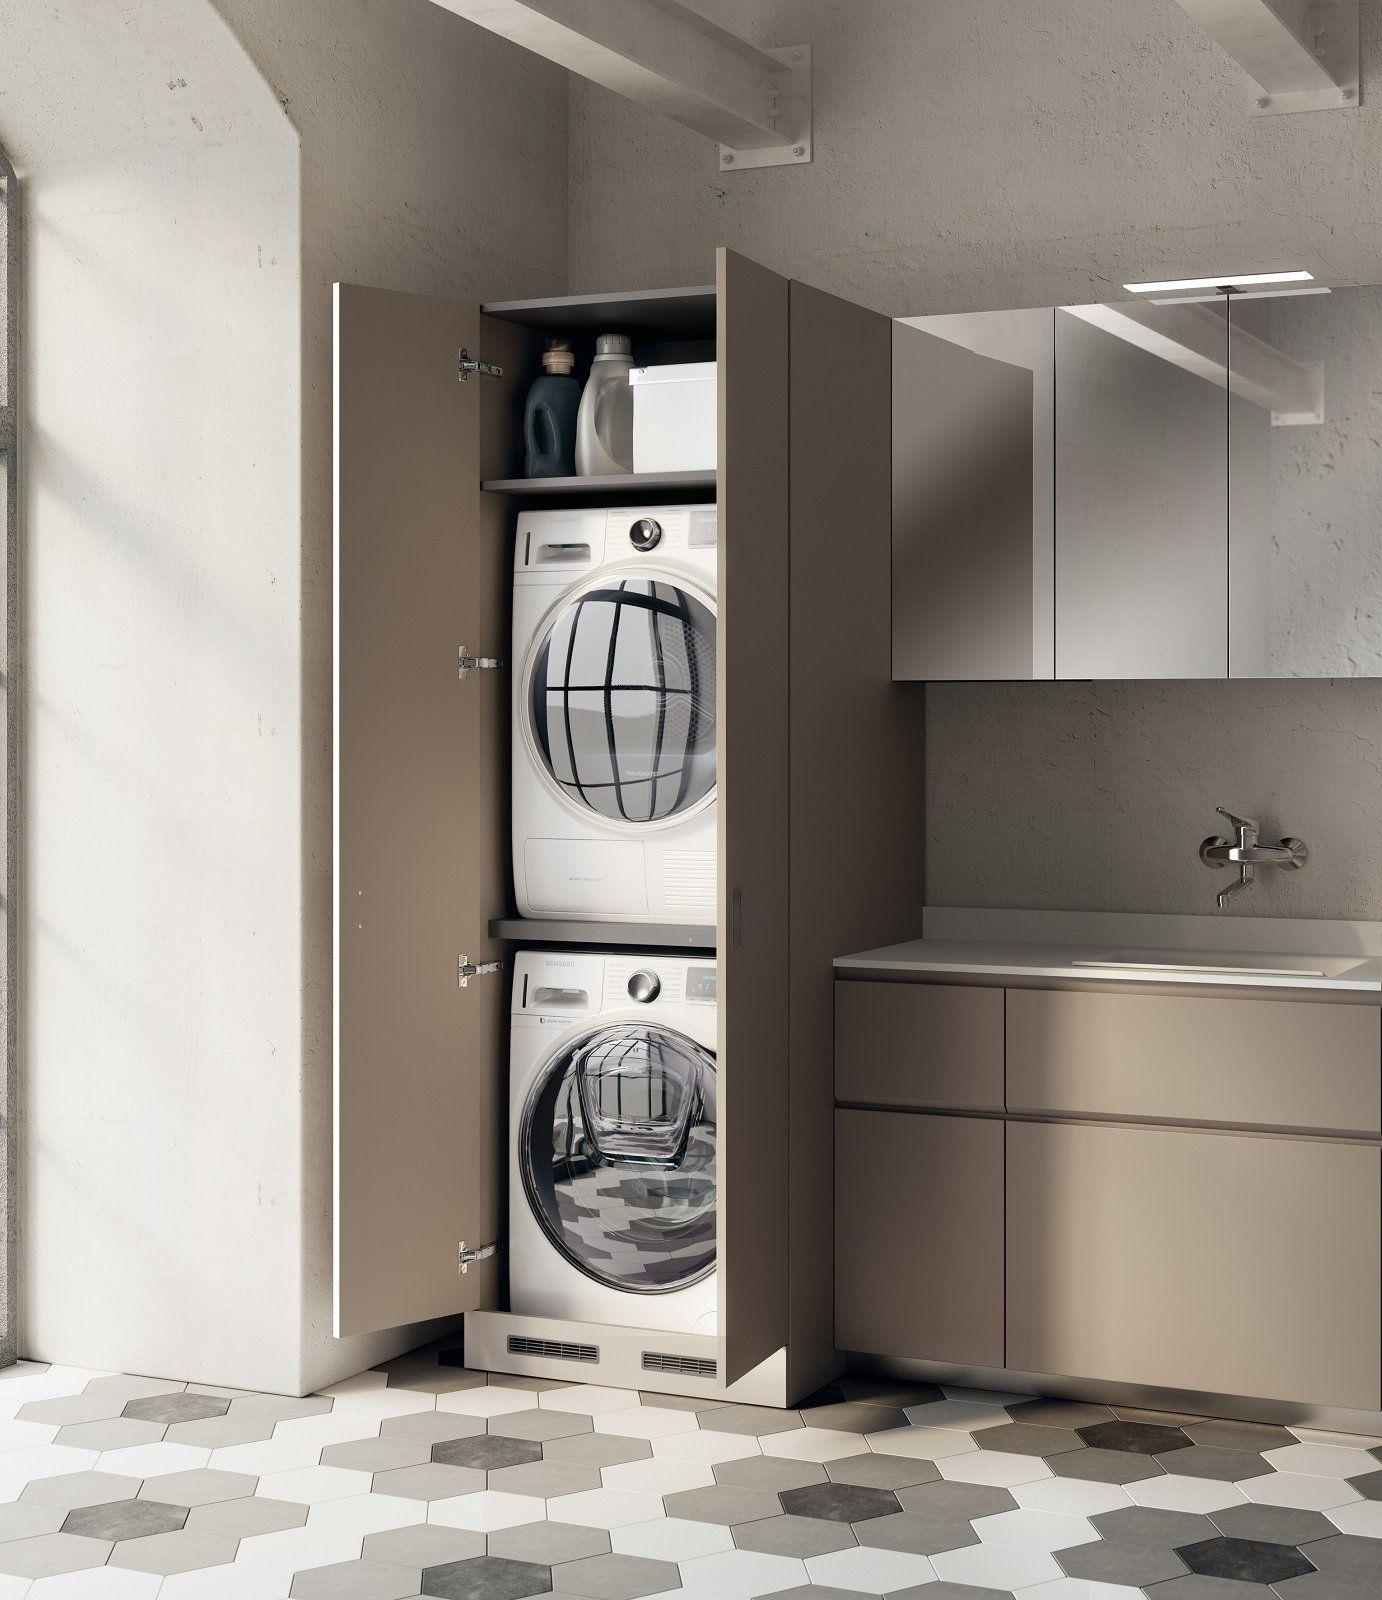 Lavanderia in bagno  studio  Laundry bathroom combo